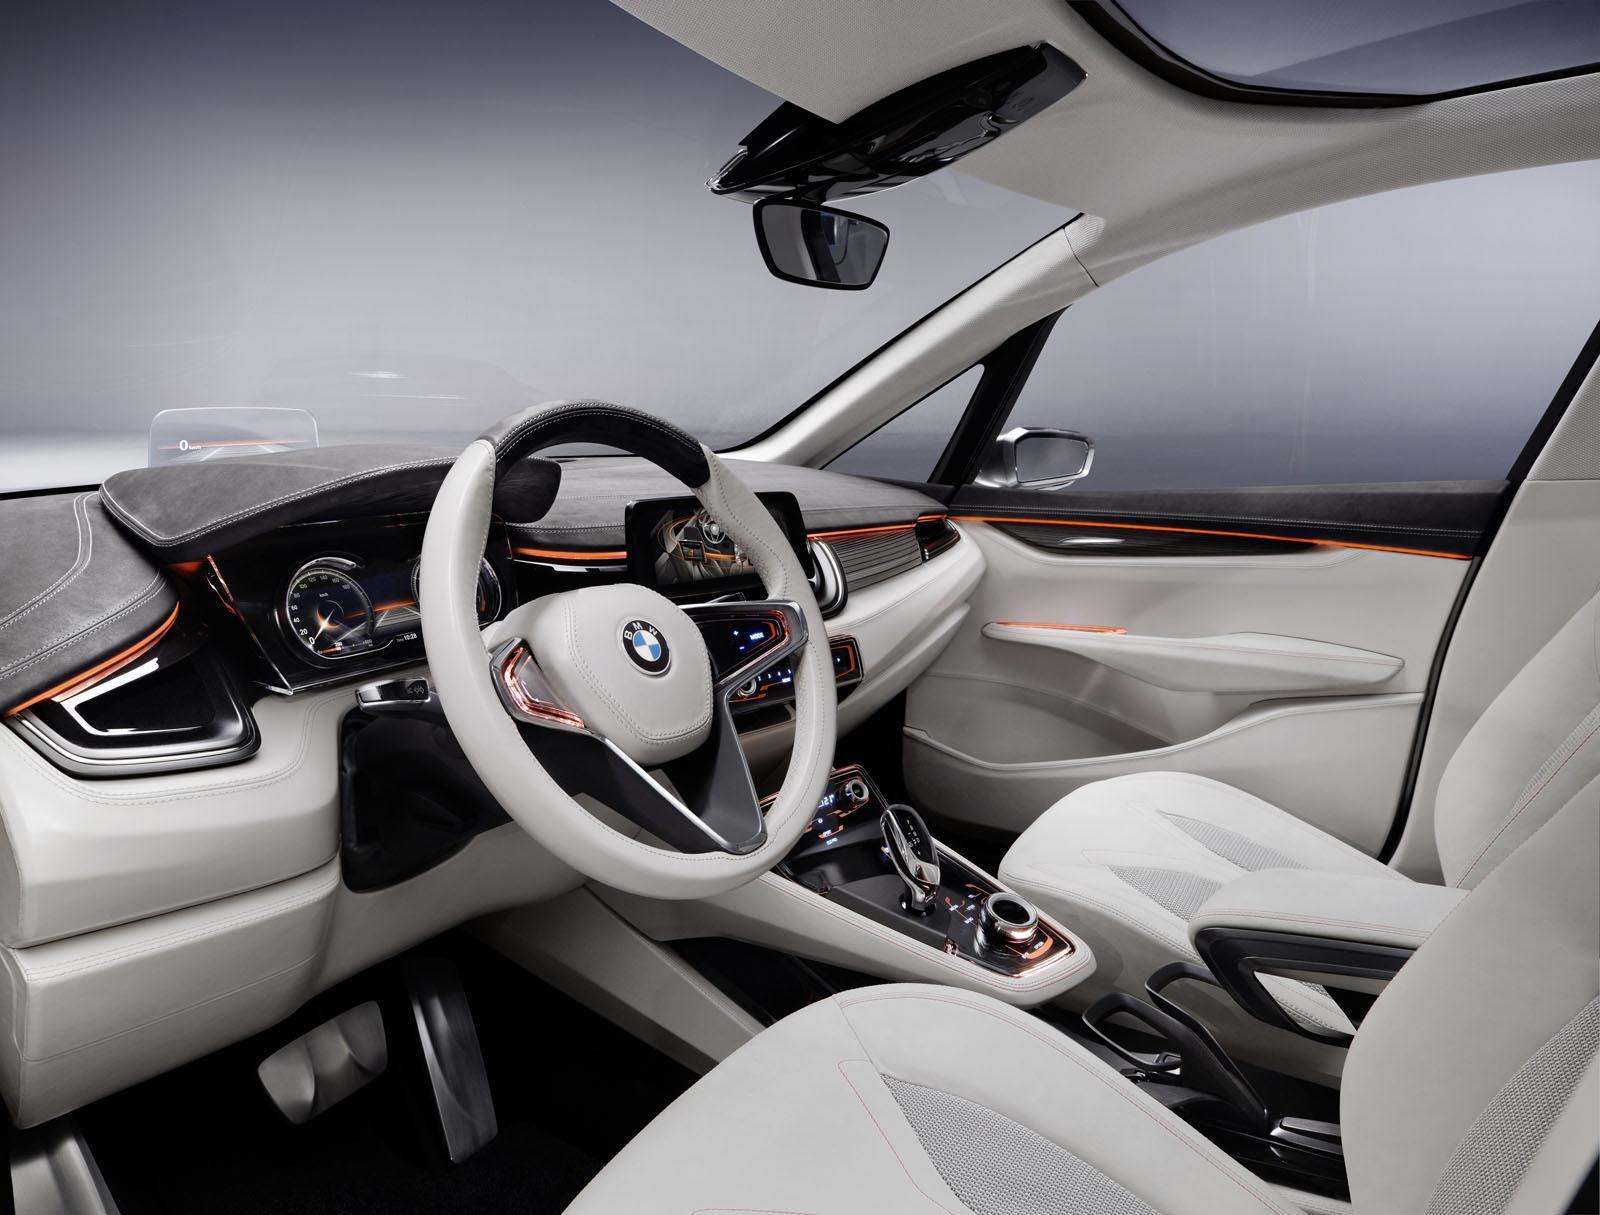 BMW 1 Series GT Concept